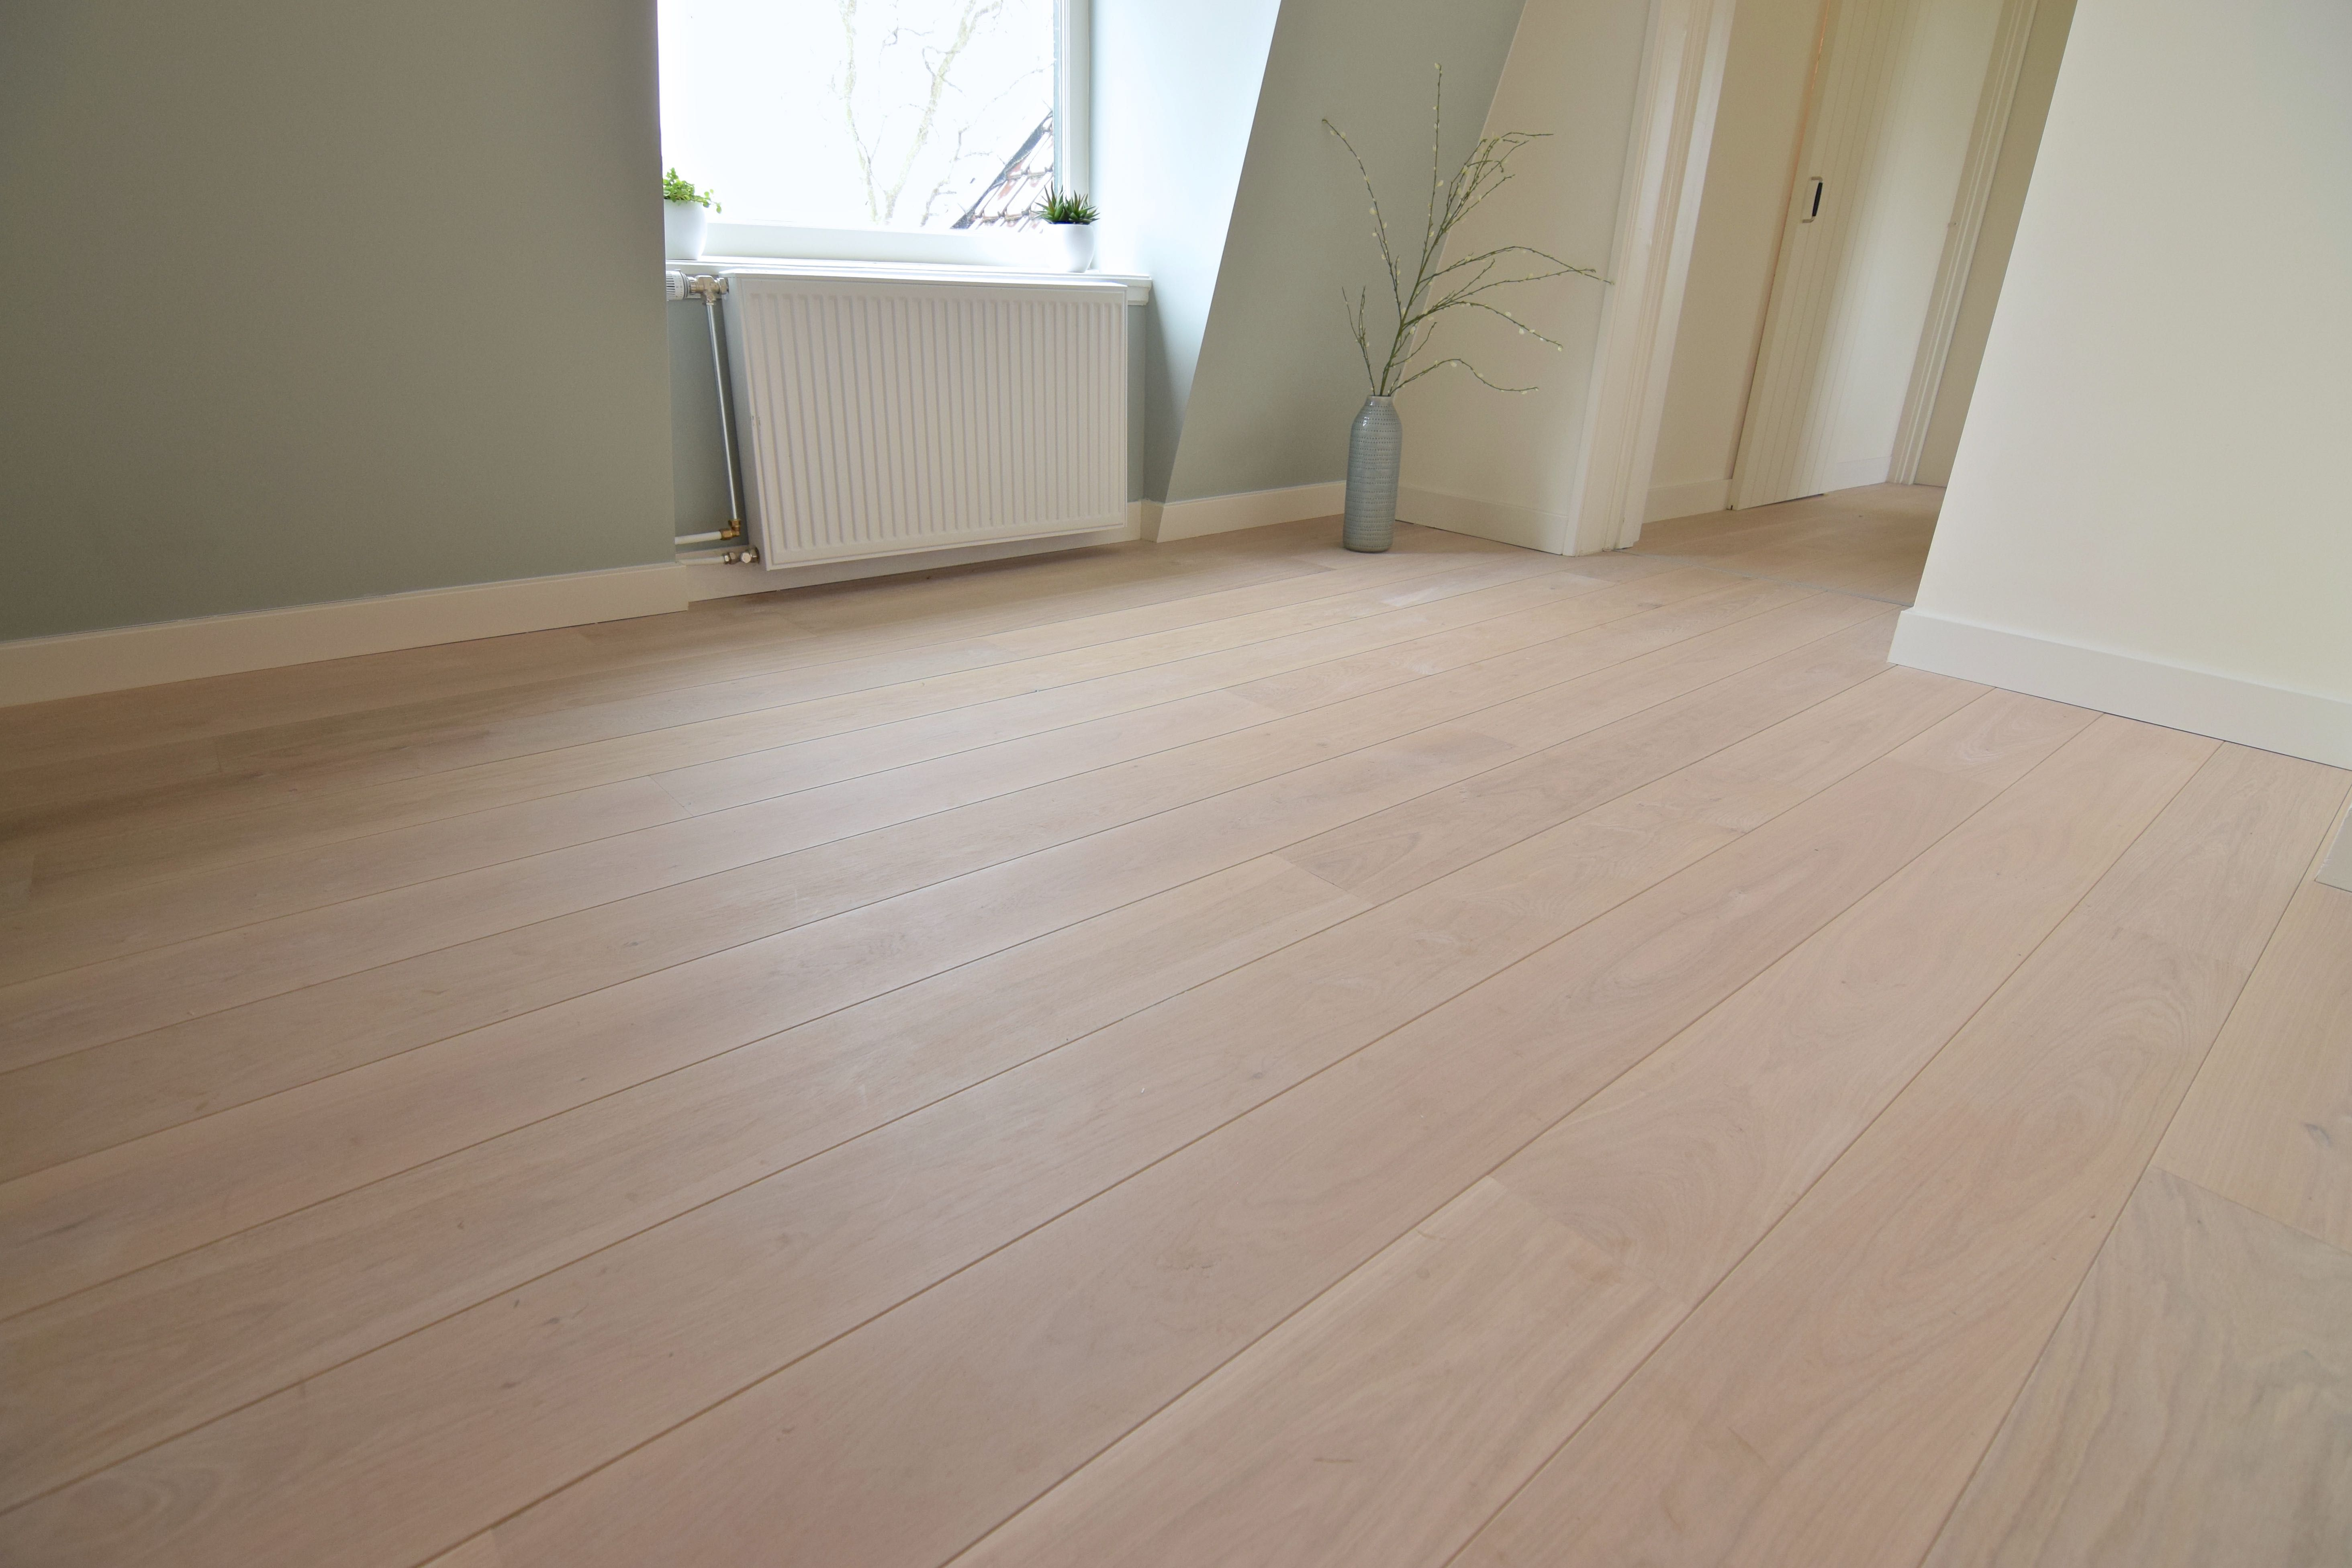 Witte Houten Vloer : Witte houten vloer inspiratie houten vloeren in 2018 pinterest